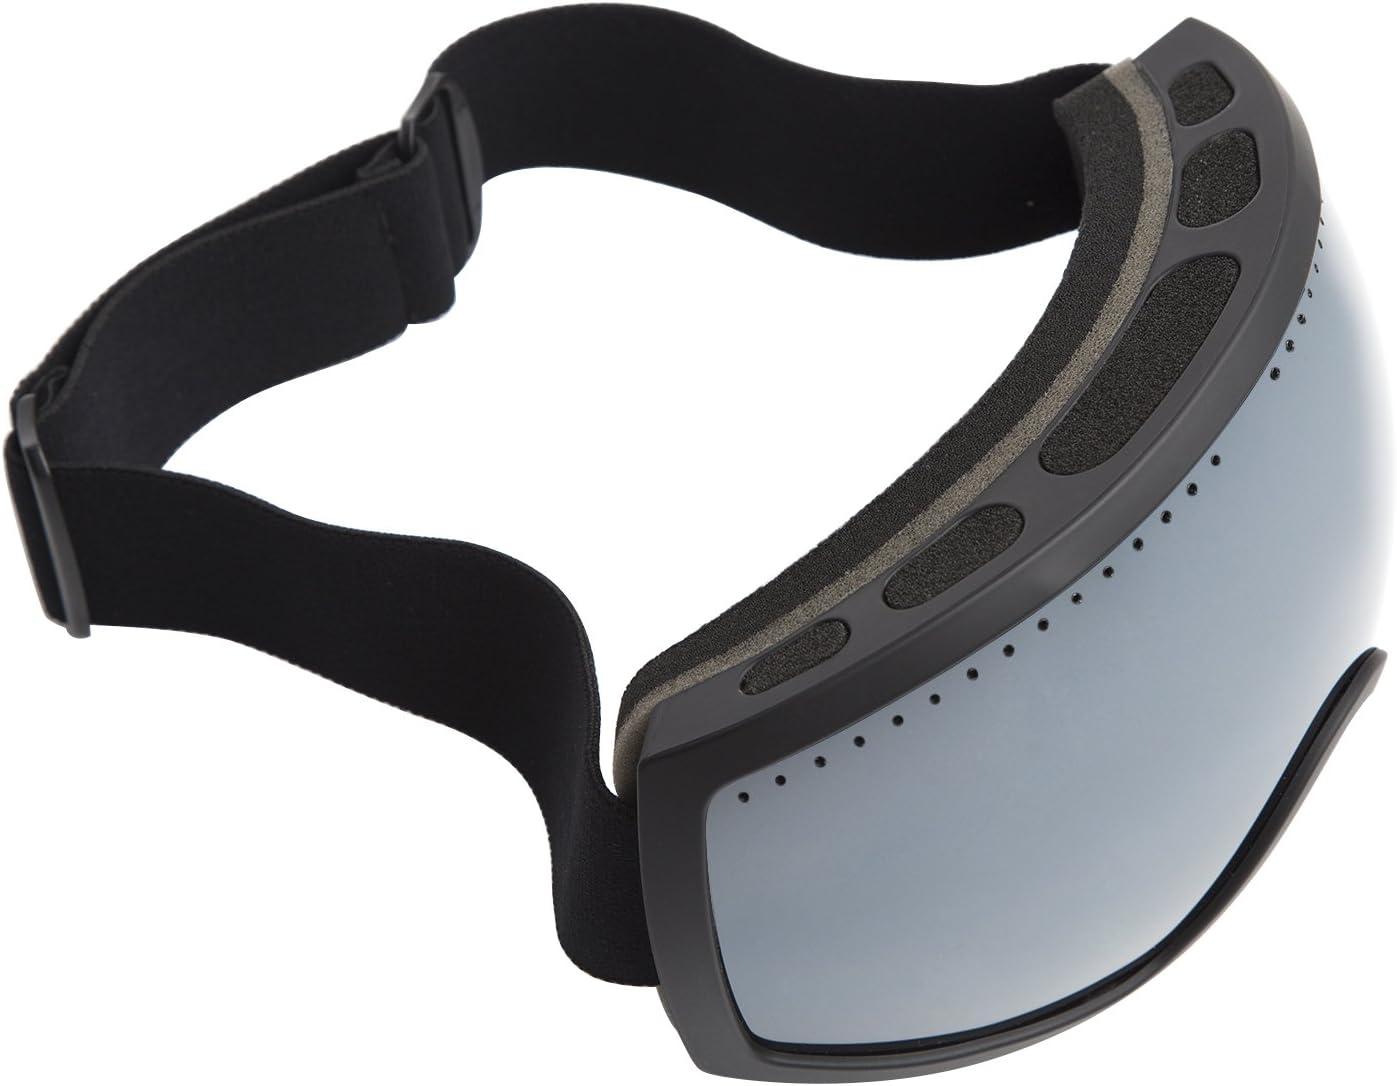 ABG Accessories Adult Ski Goggles Anti-Fog Ca and Pc Double Lens Snowboard Black TPU Matt Frame